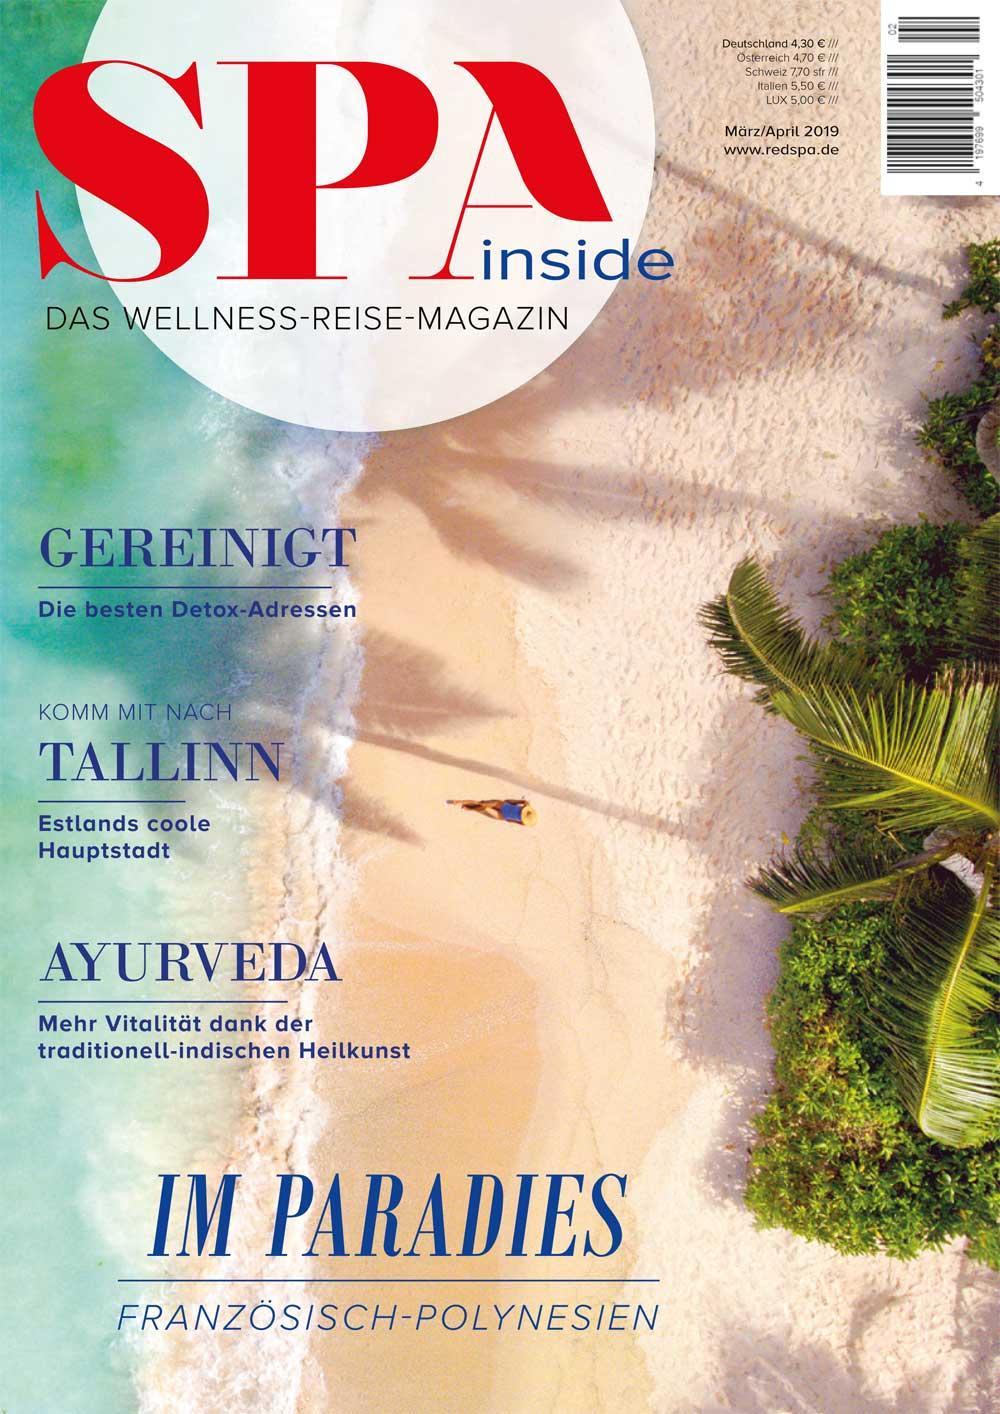 SPA inside - Ausgabe 02/2019